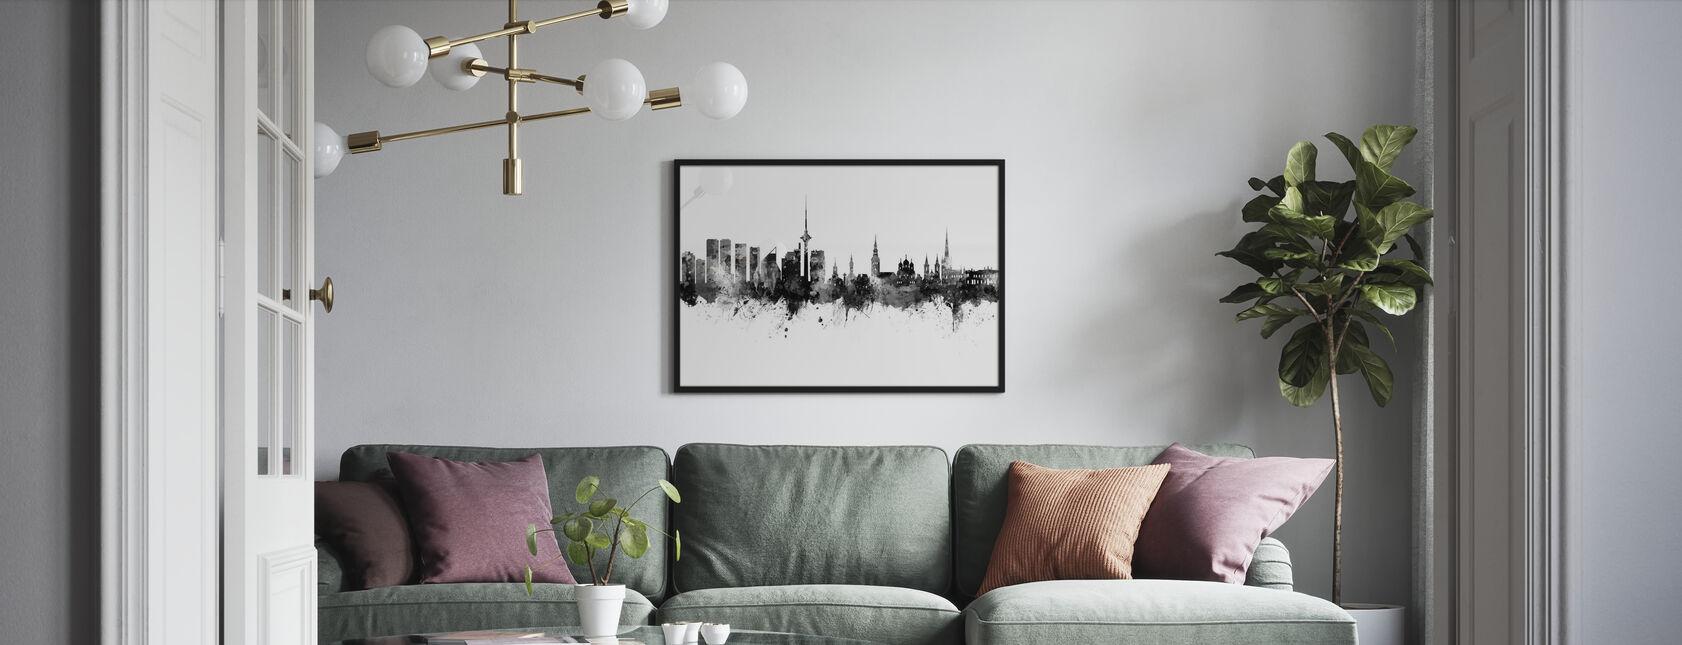 Tallinn Estonia Skyline - Poster - Living Room